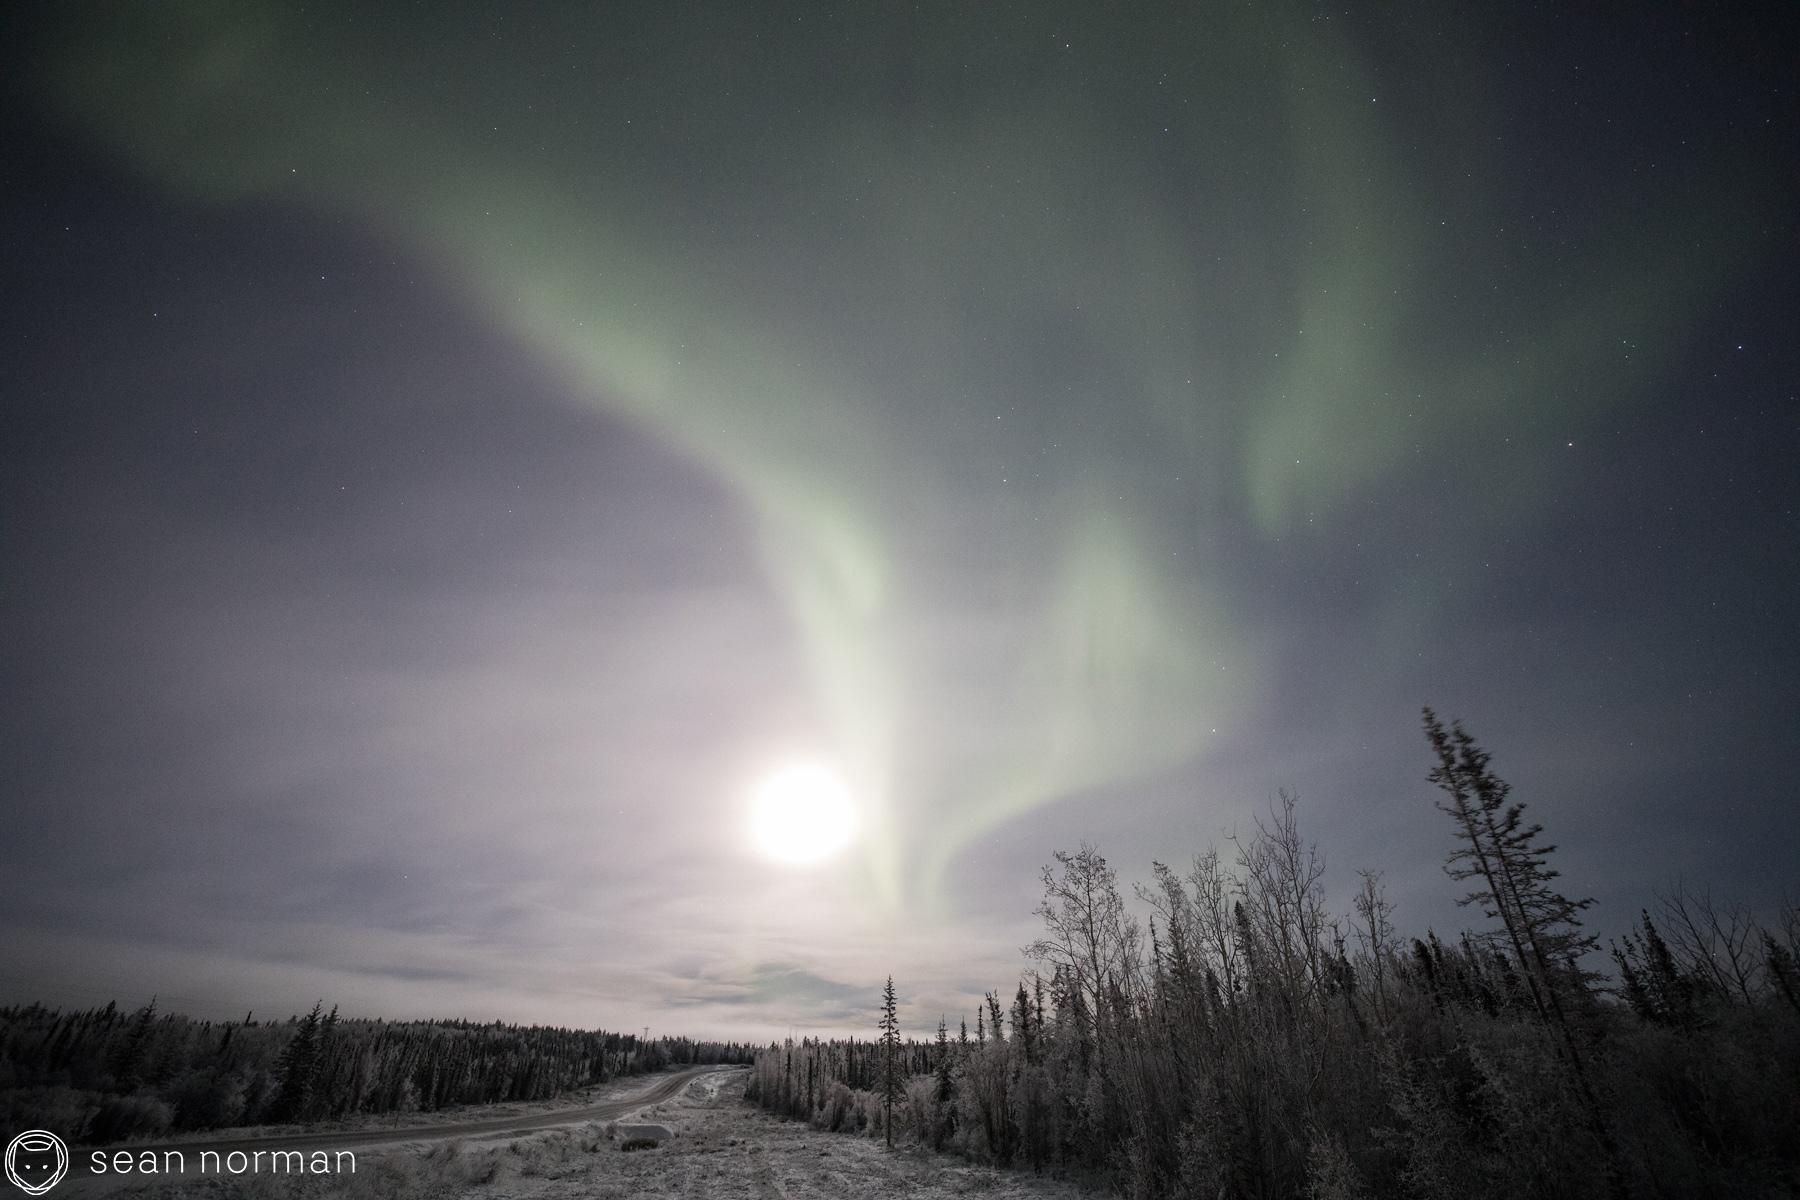 December Aurora Borealis Tour Yellowknife Canada - 3.jpg